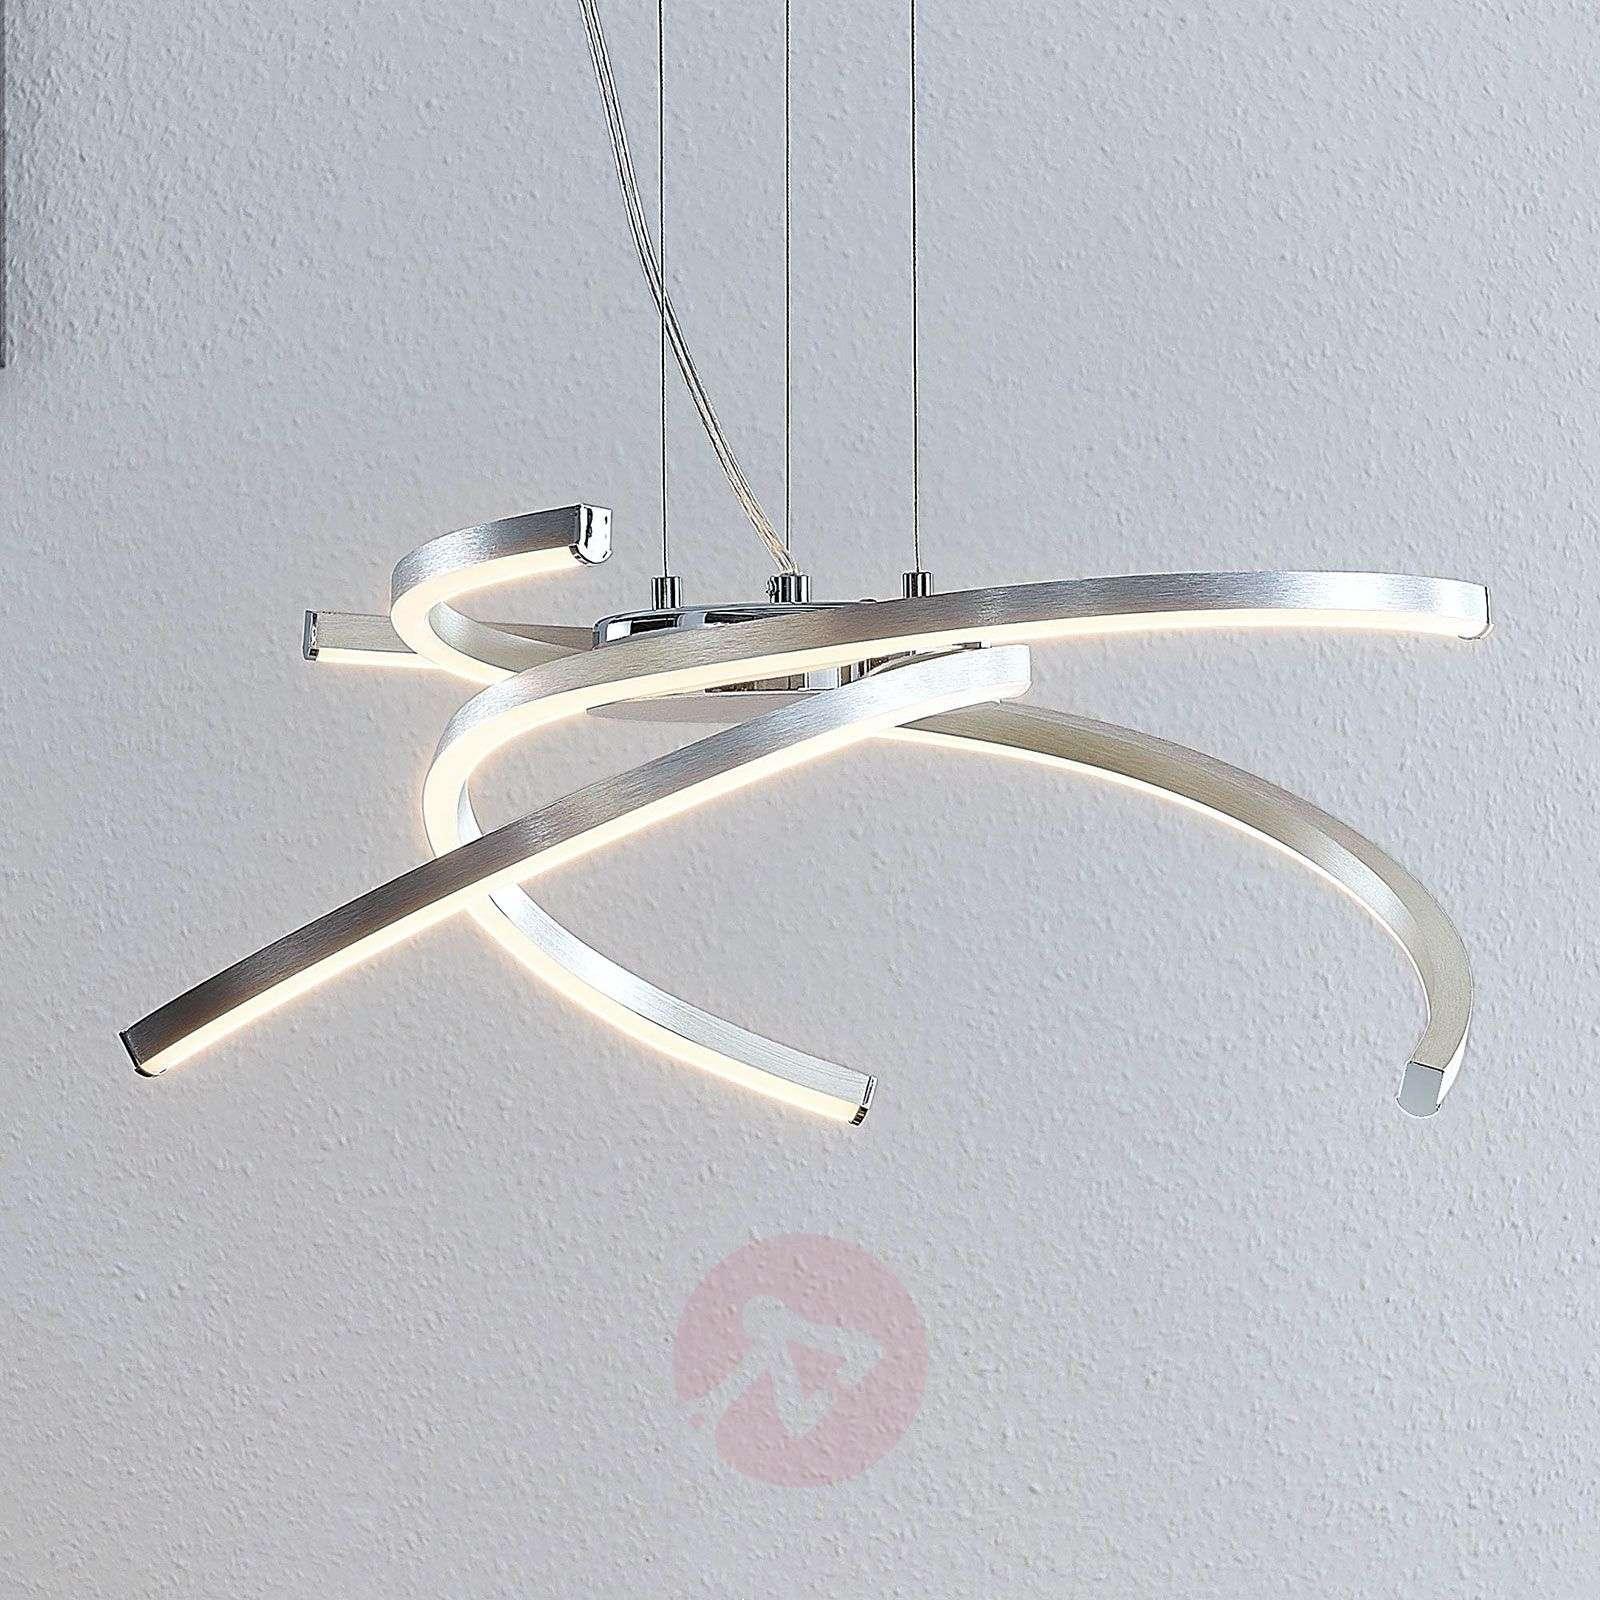 Lindby Katris LED-riippuvalaisin, 58 cm, alumiini-9639152-02